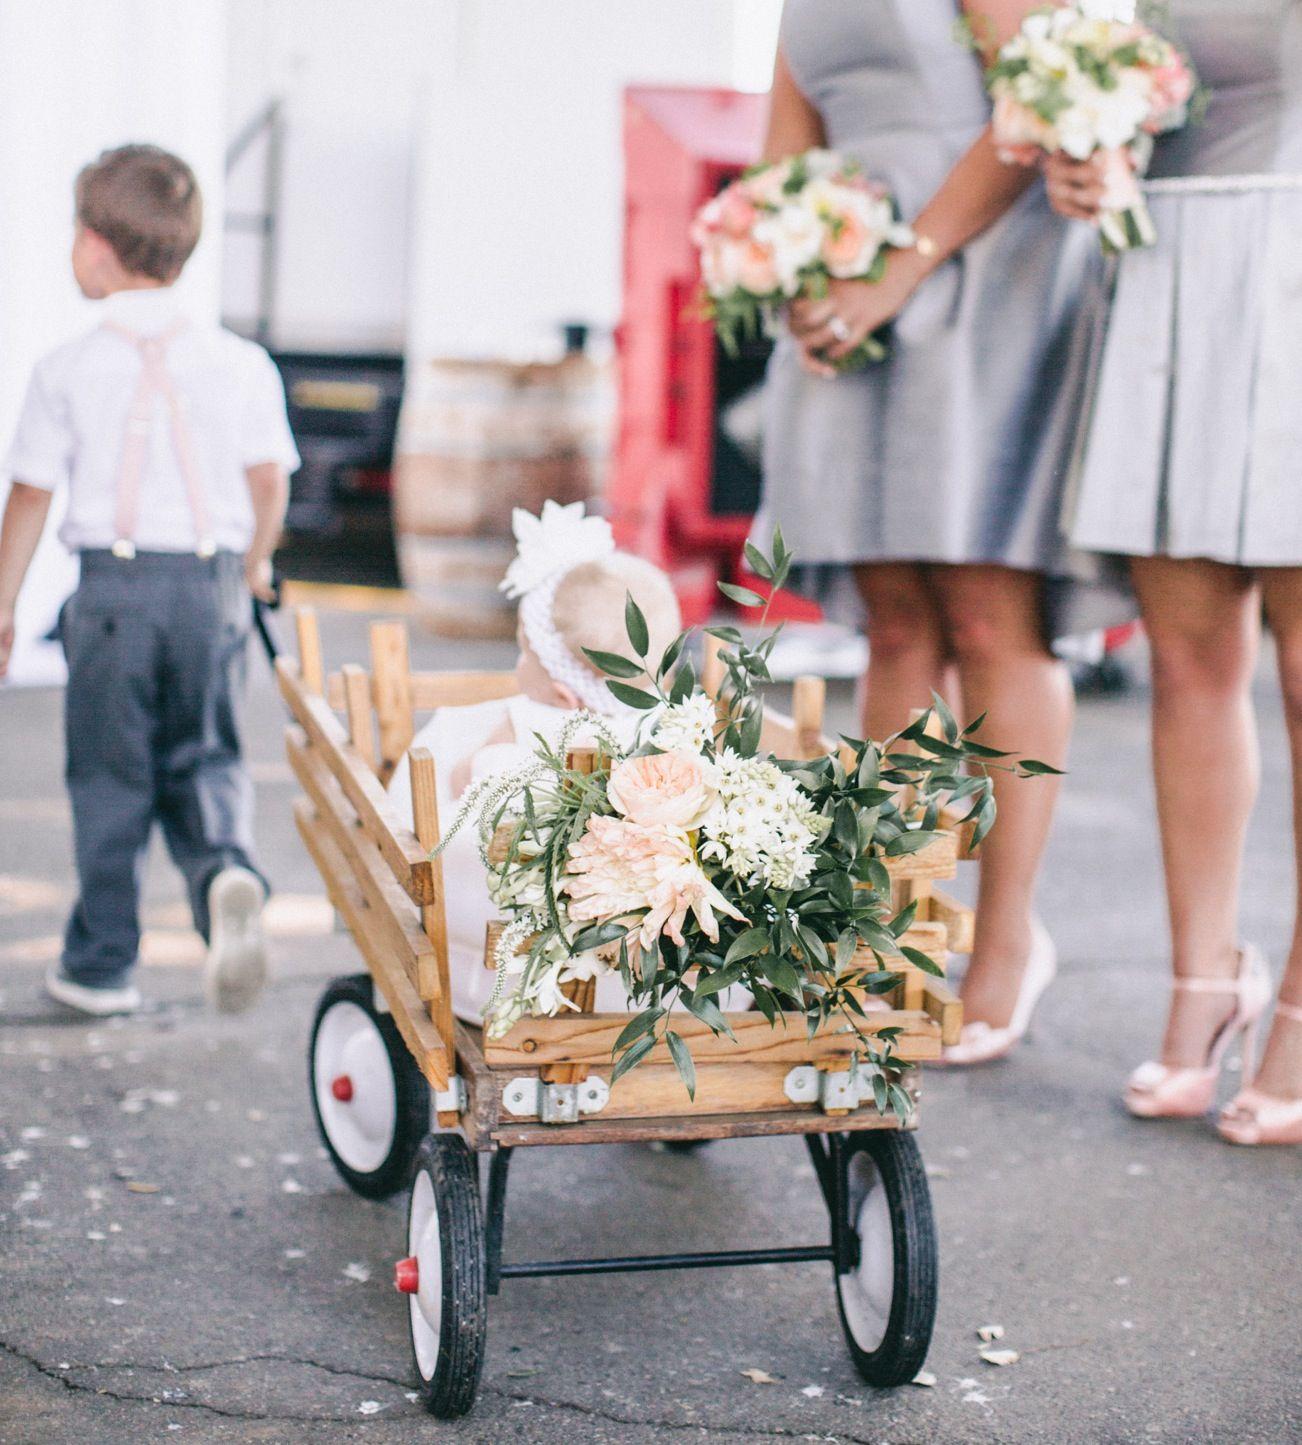 Medium Flower Girl Wedding Wagon Unfinished |Flower Girl Wagon Wedding Party